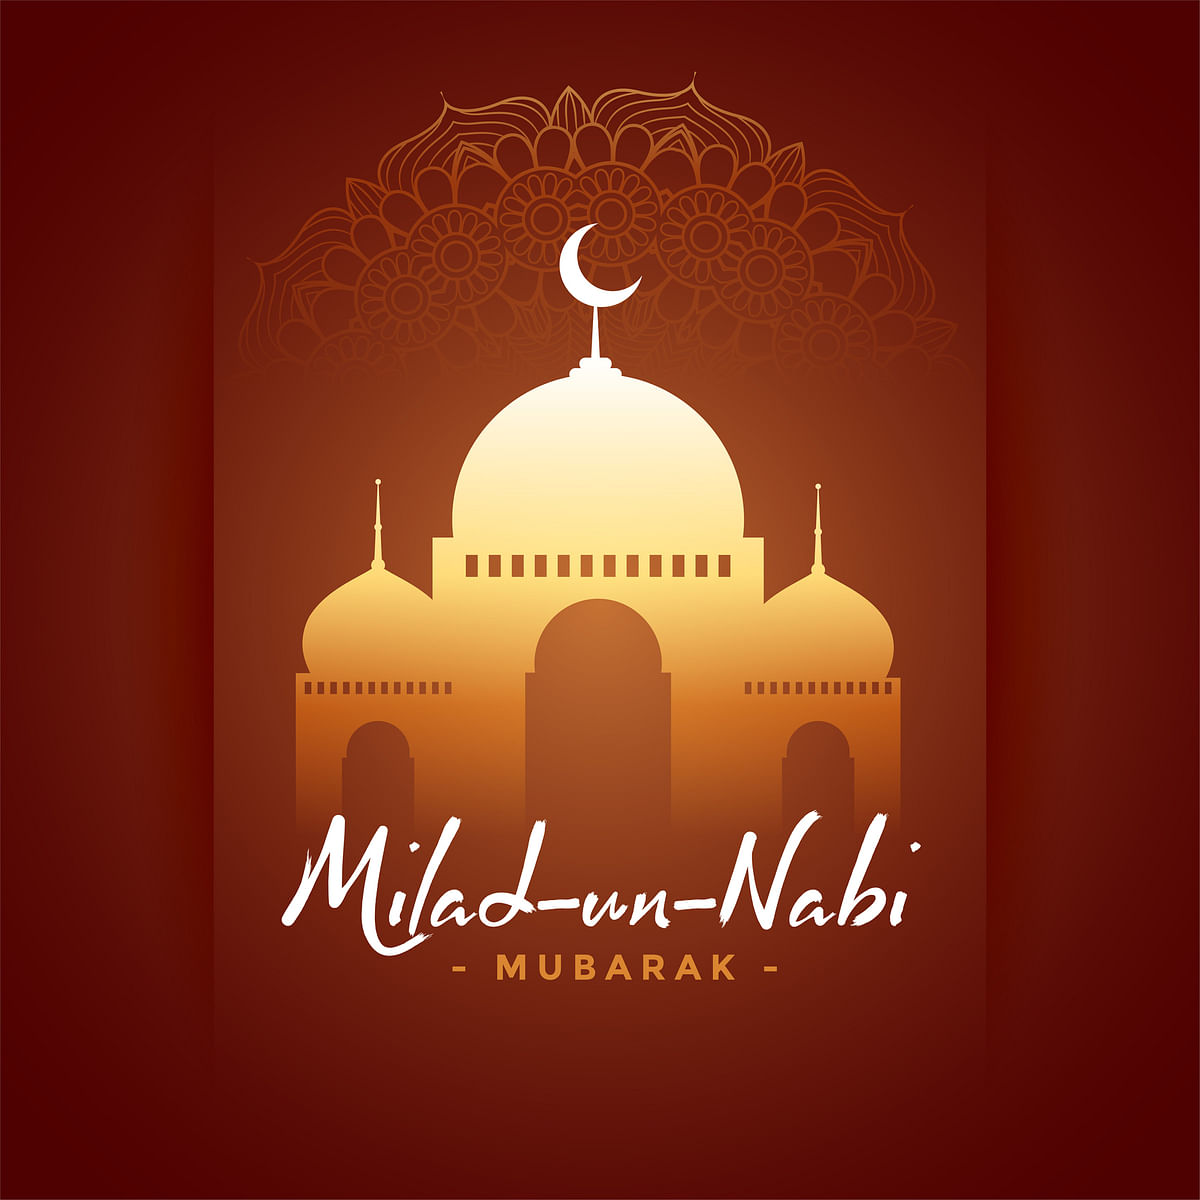 Happy Eid Milad-un-Nabi!